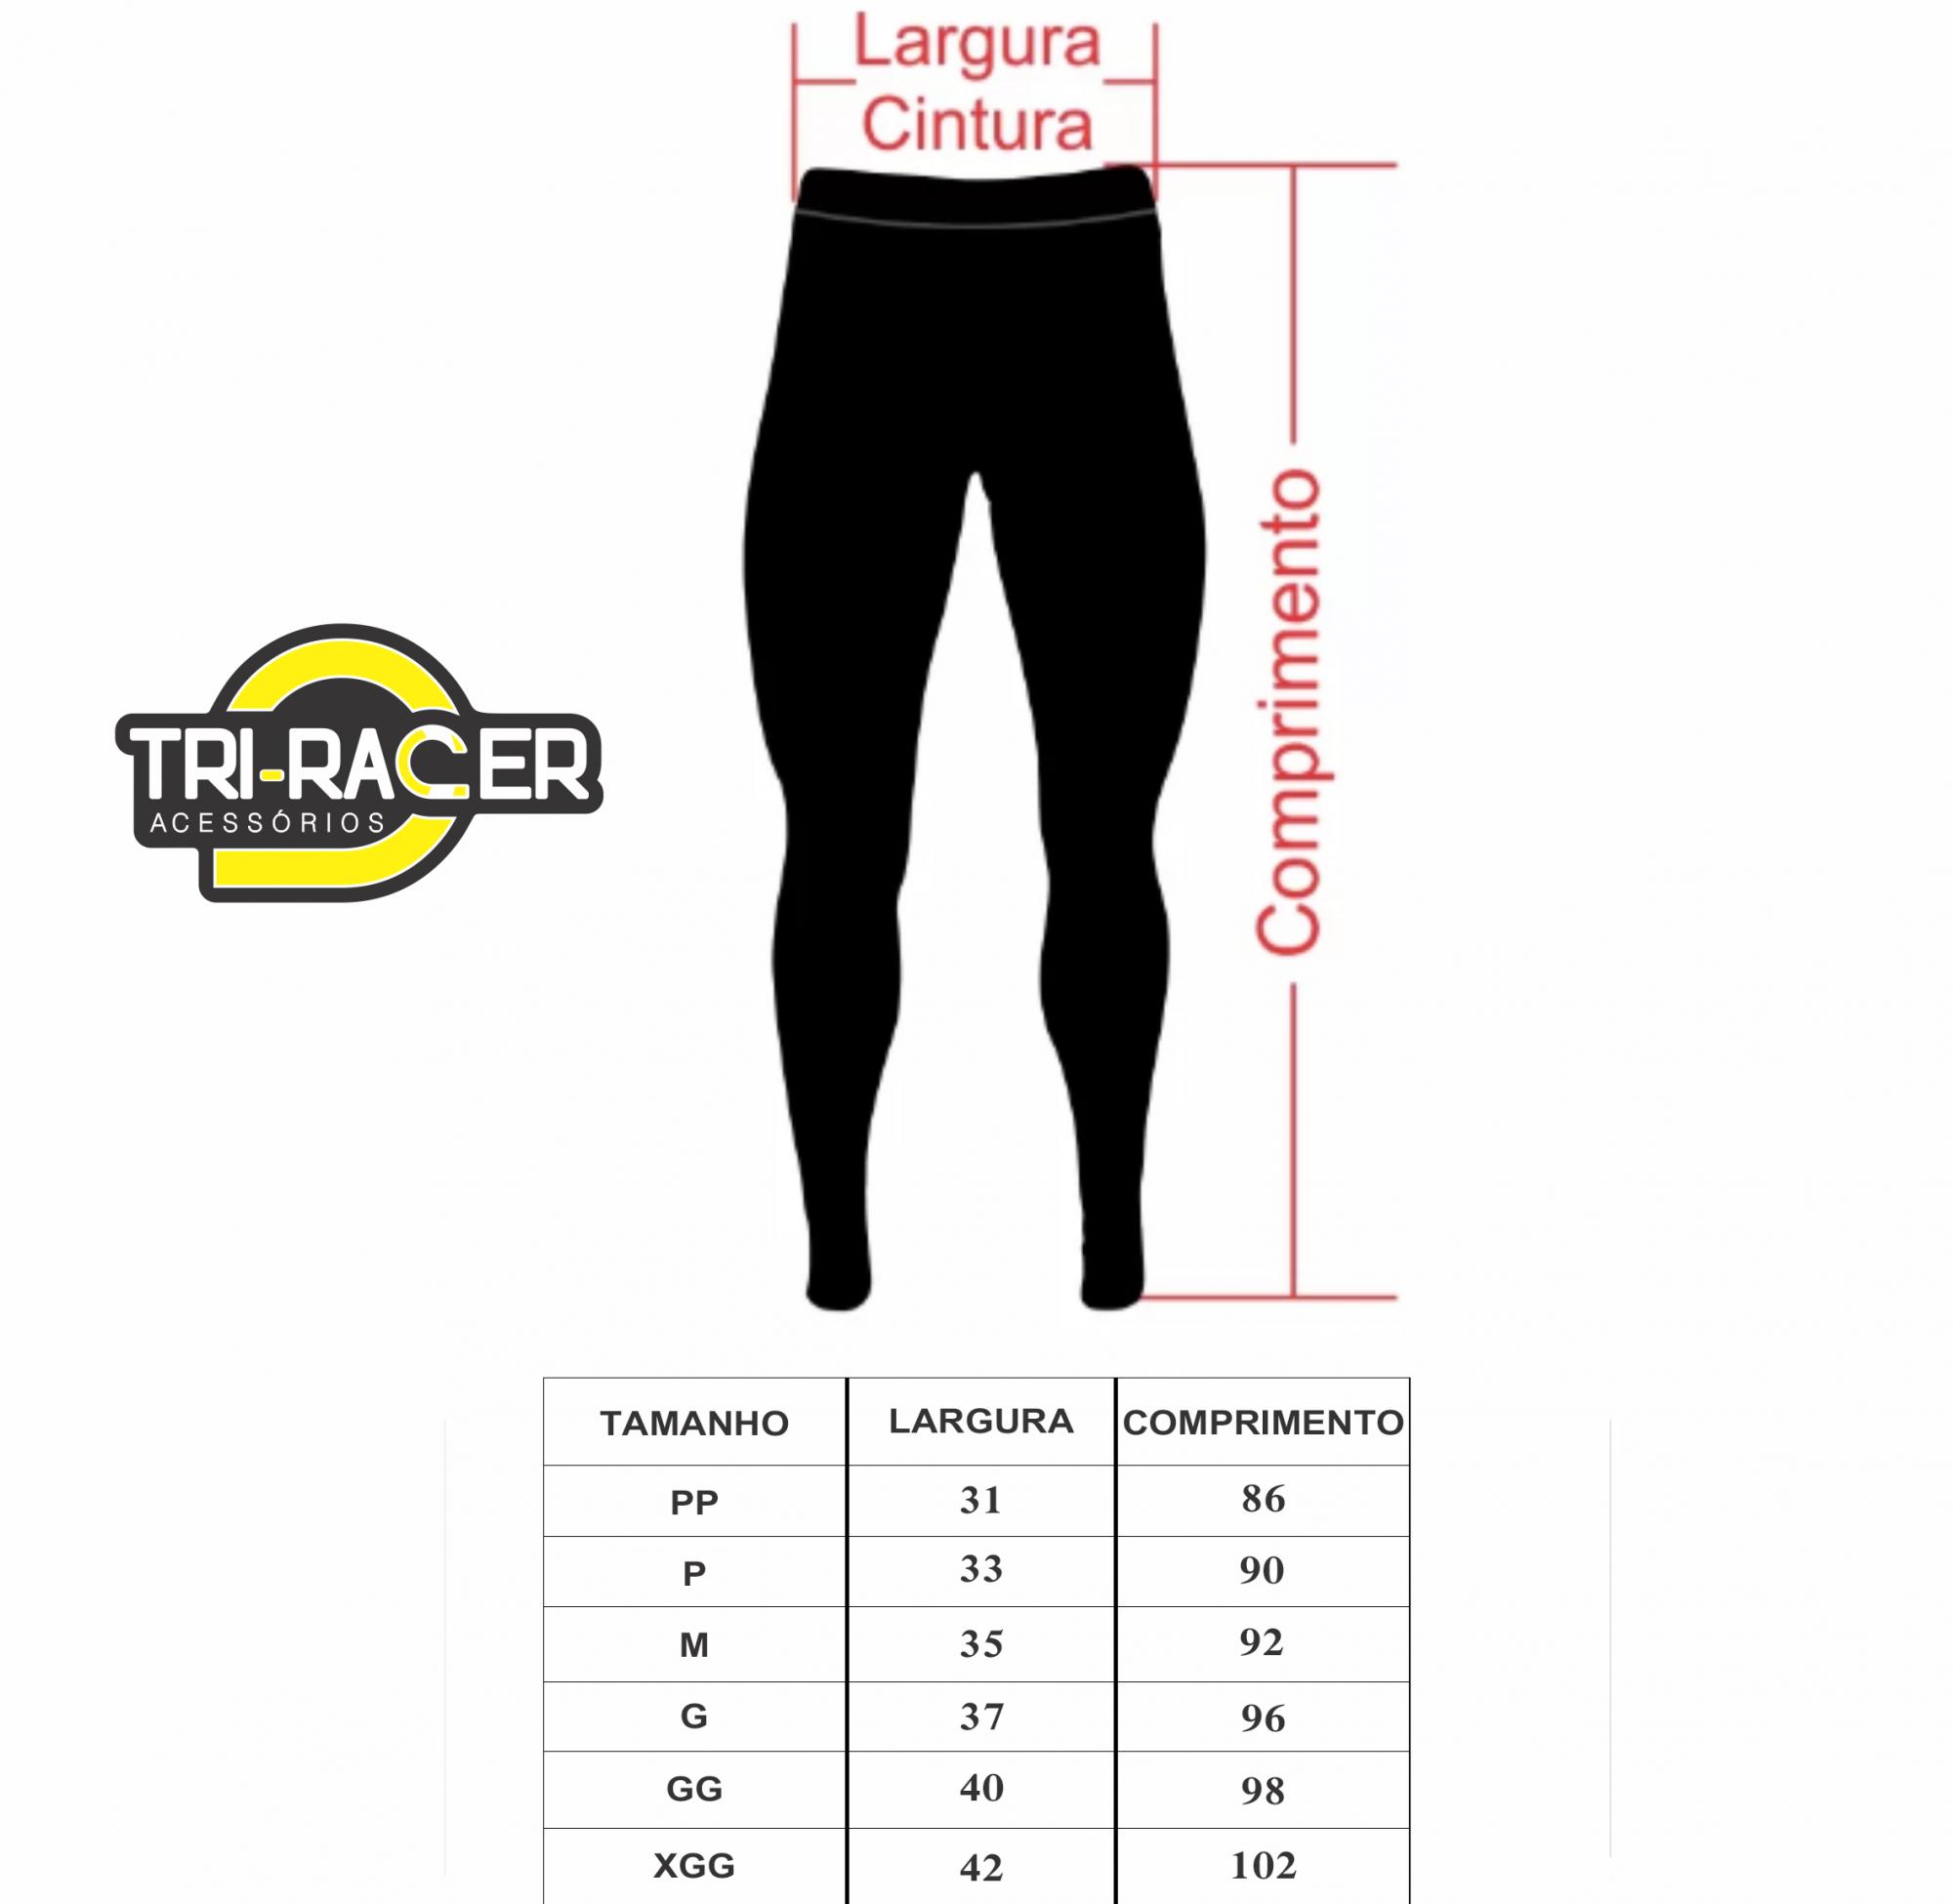 Conjunto Térmico Longo +50 UV Masc. DRY SPEED